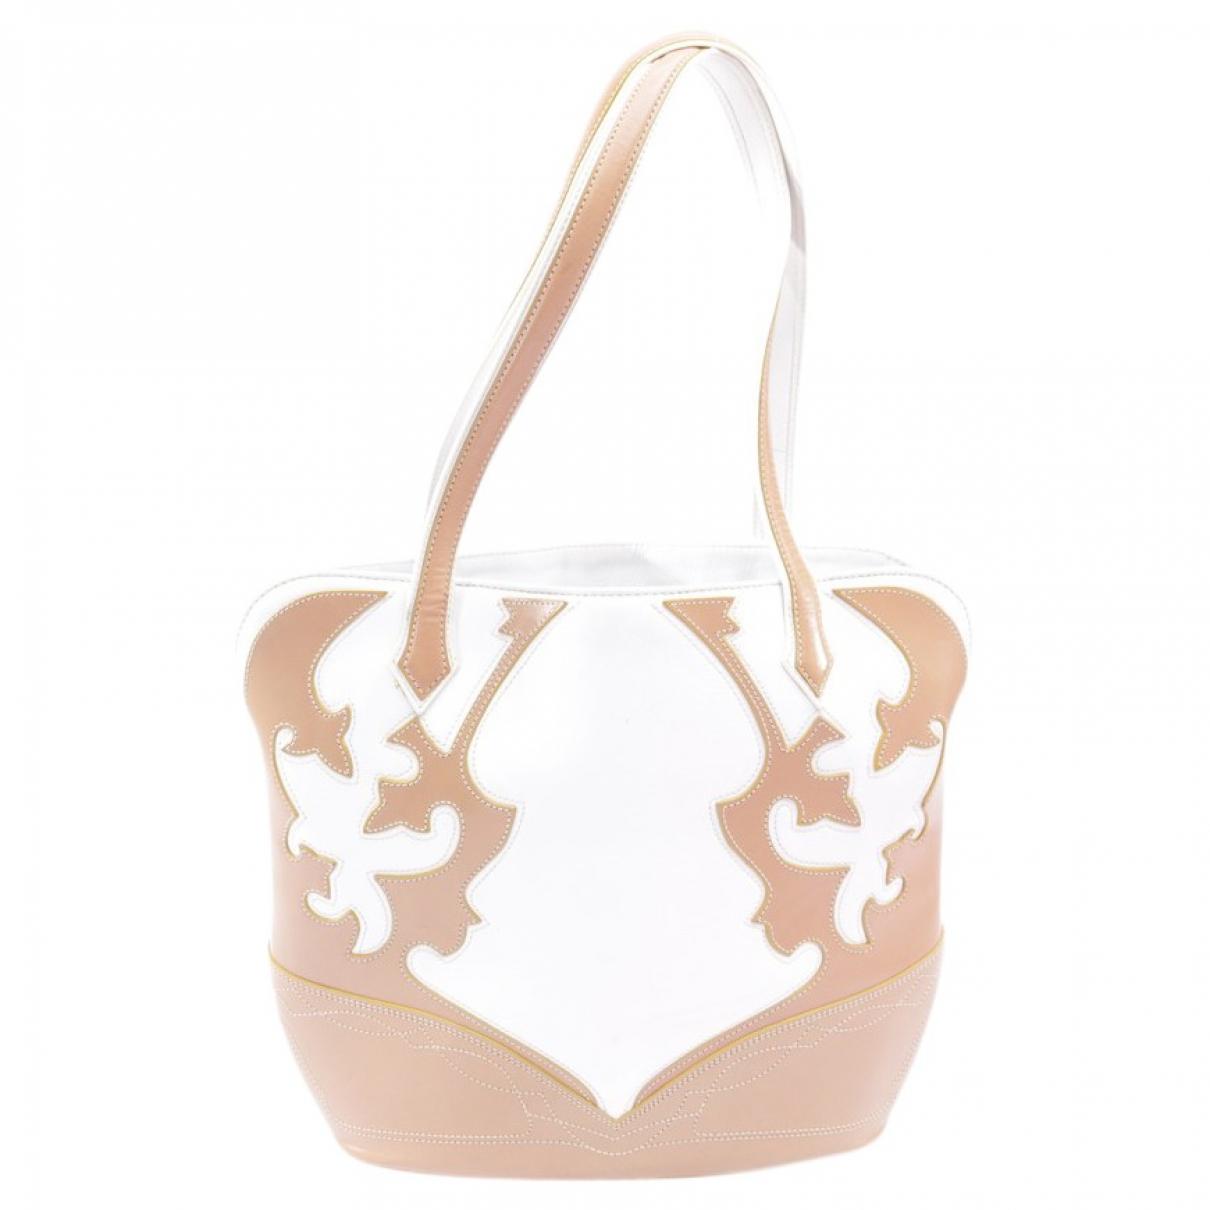 Etro \N Beige Leather handbag for Women \N